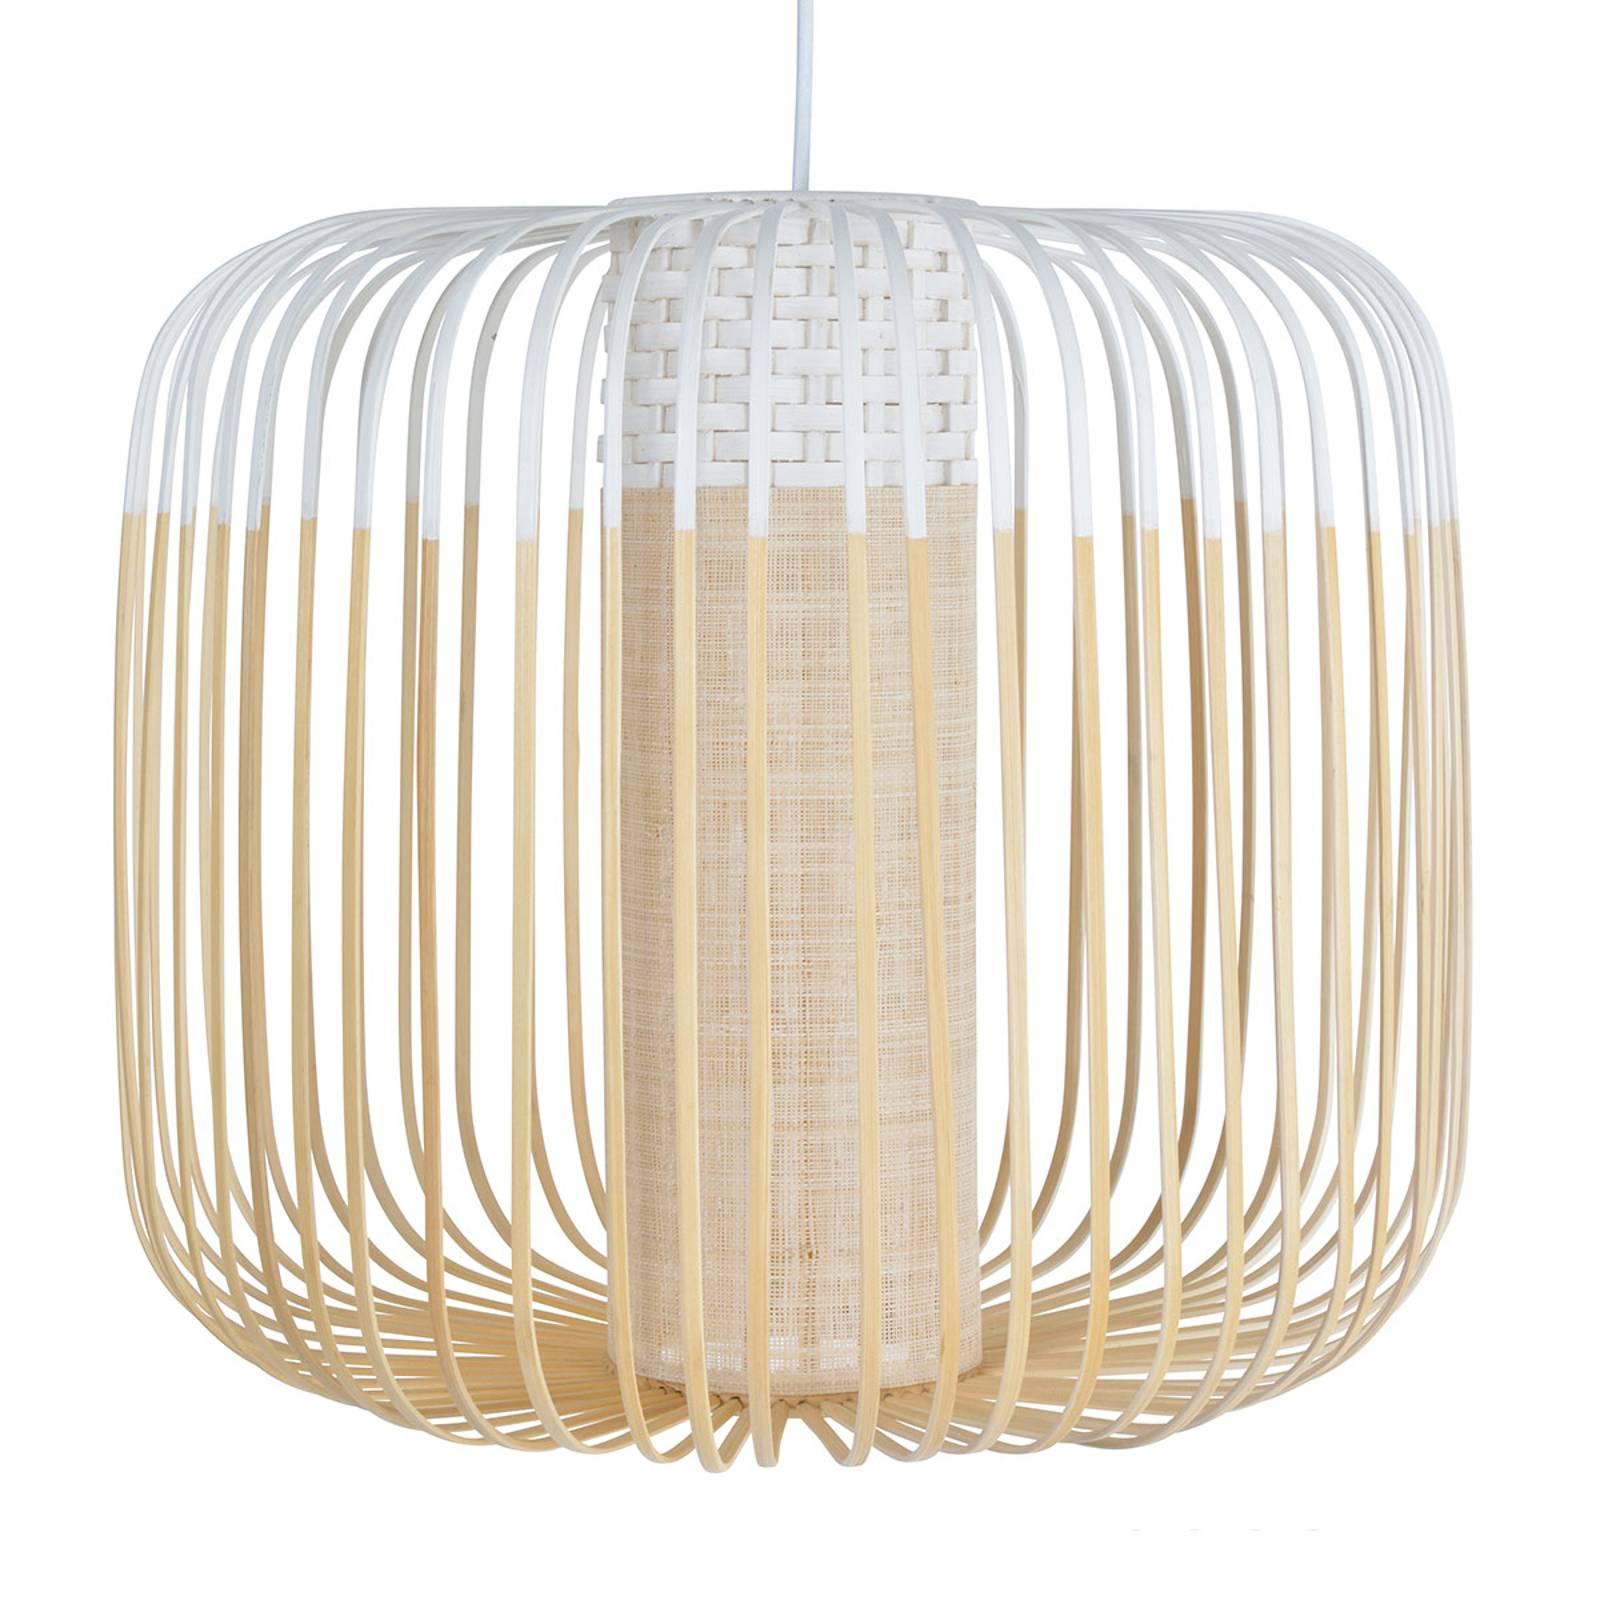 Forestier Bamboo Light M-riippuvalo 45cm valkoinen